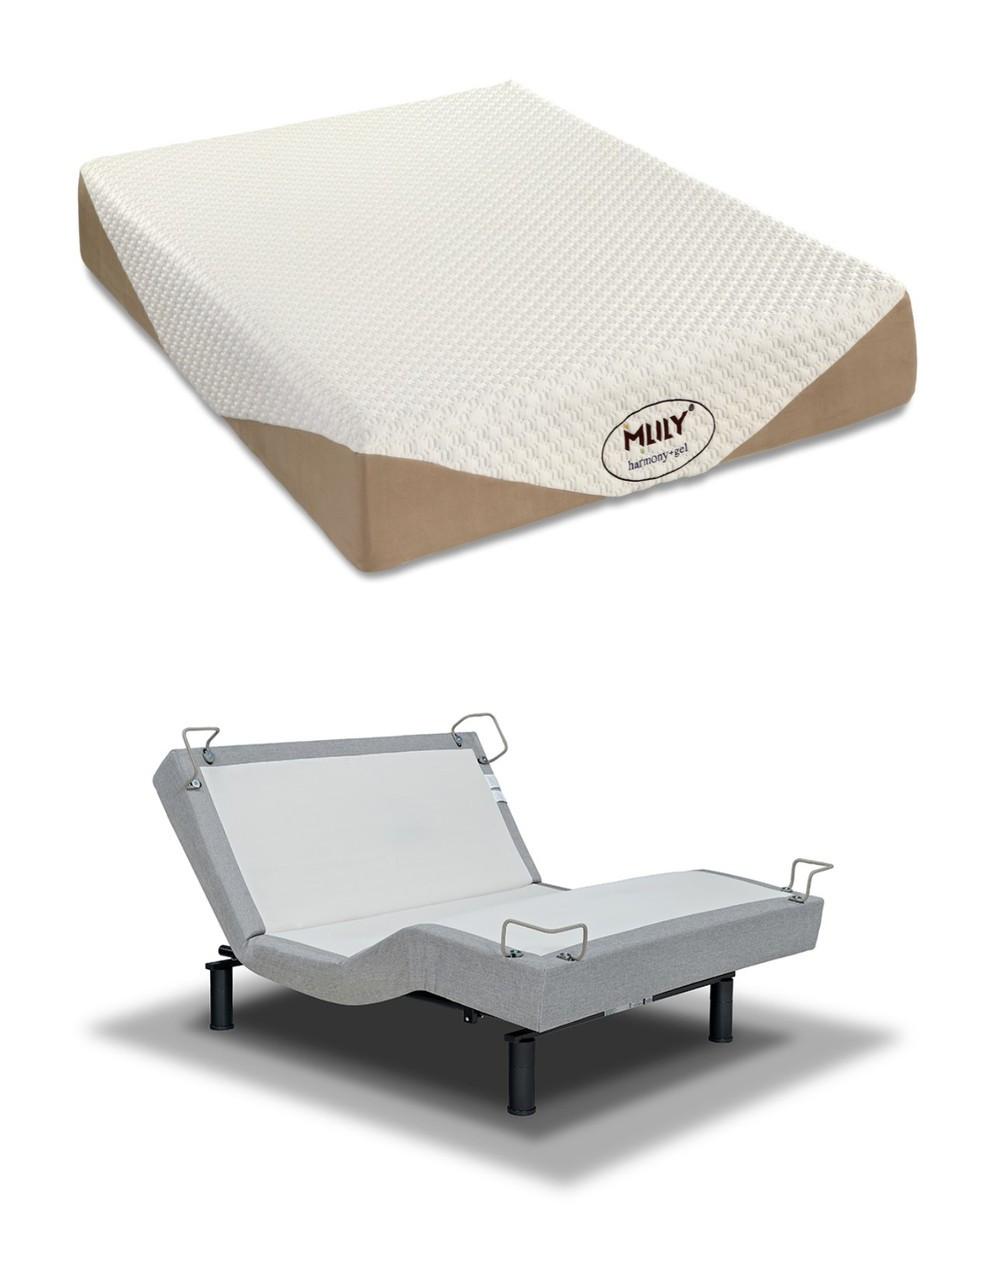 Mlily harmony 10 gel memory foam mattress reverie 5d adjustable bed set